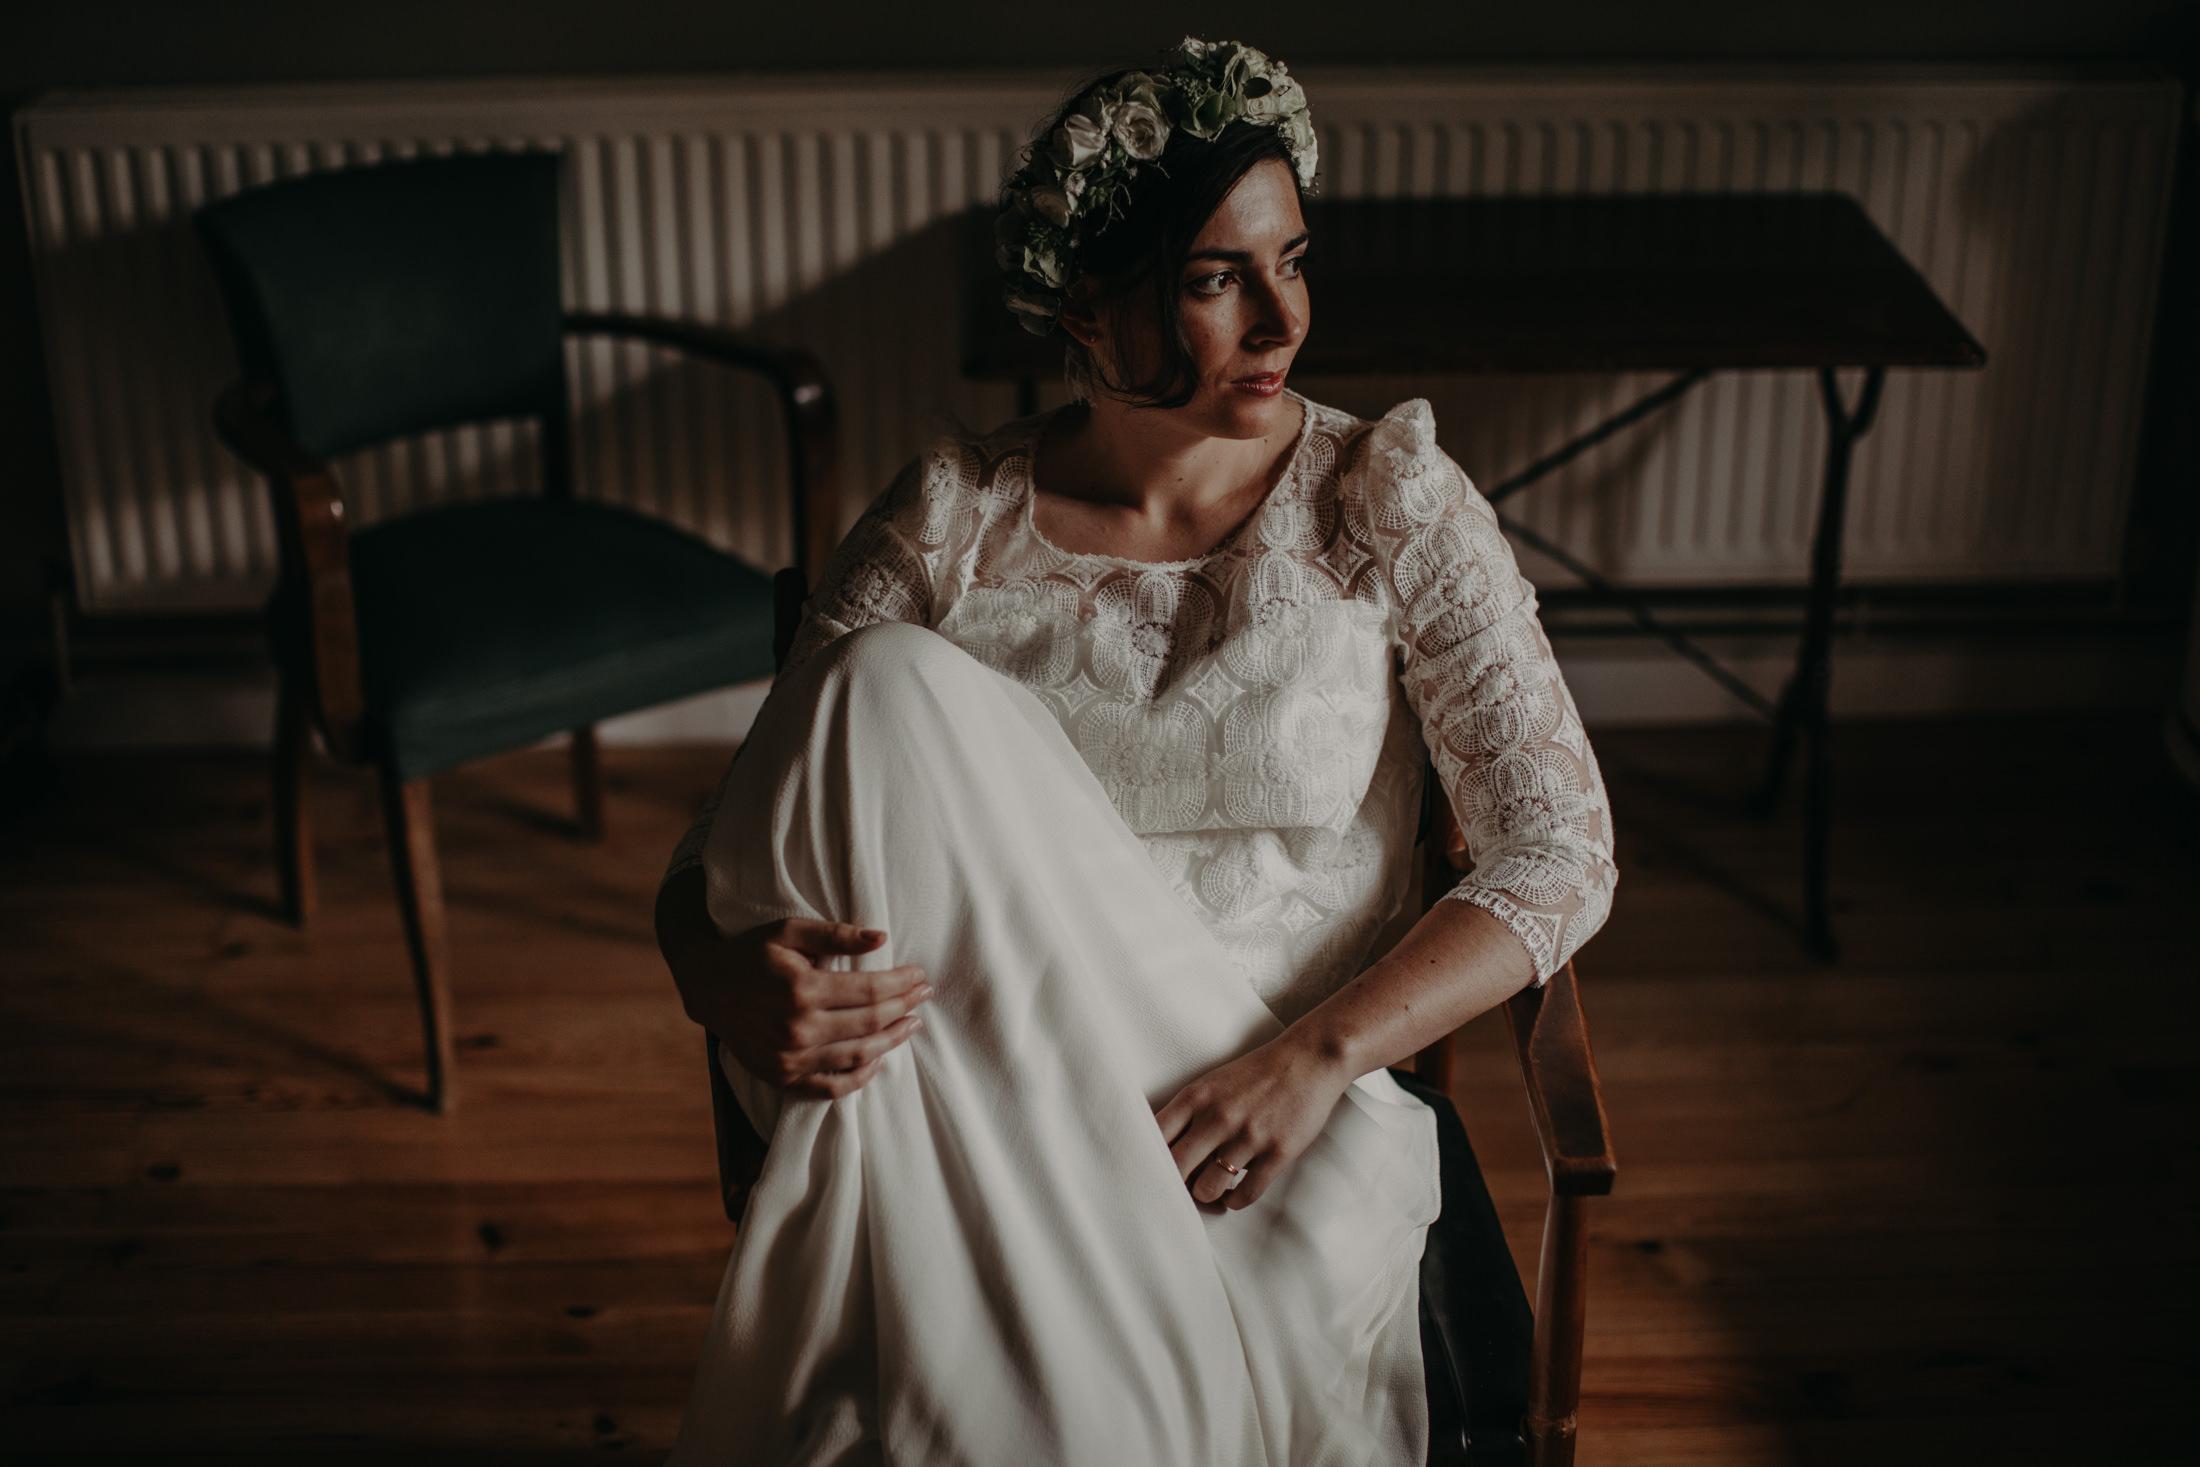 Mariage alsace germany wedding kid-29.jpg